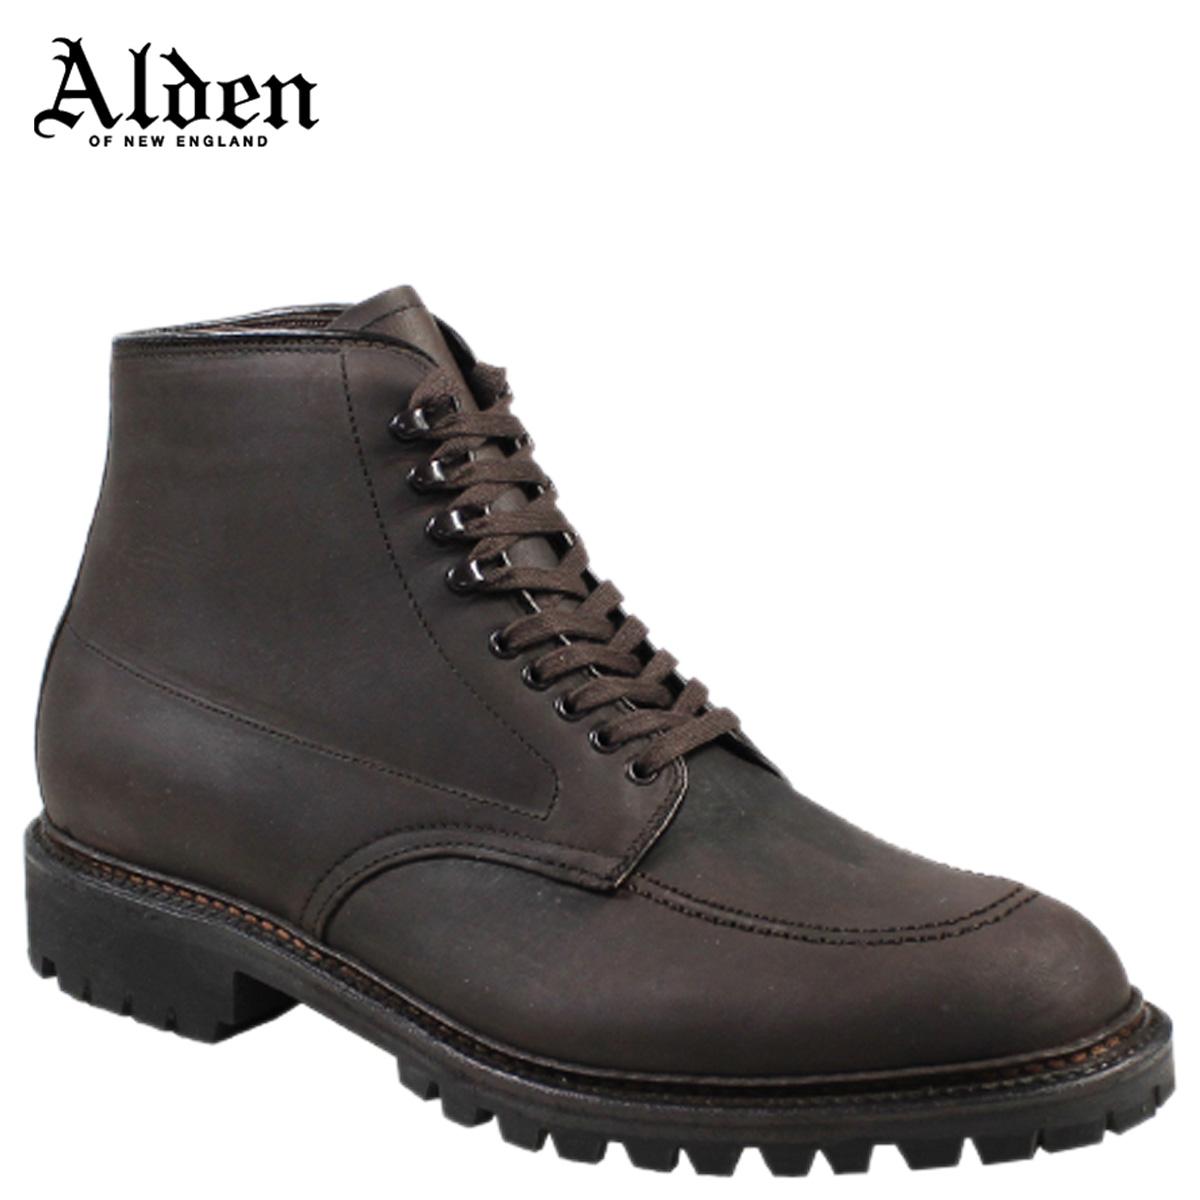 ALDEN オールデン インディー ブーツ メンズ KUDU INDY BOOT HIGH TOP BLUCHER Dワイズ 404